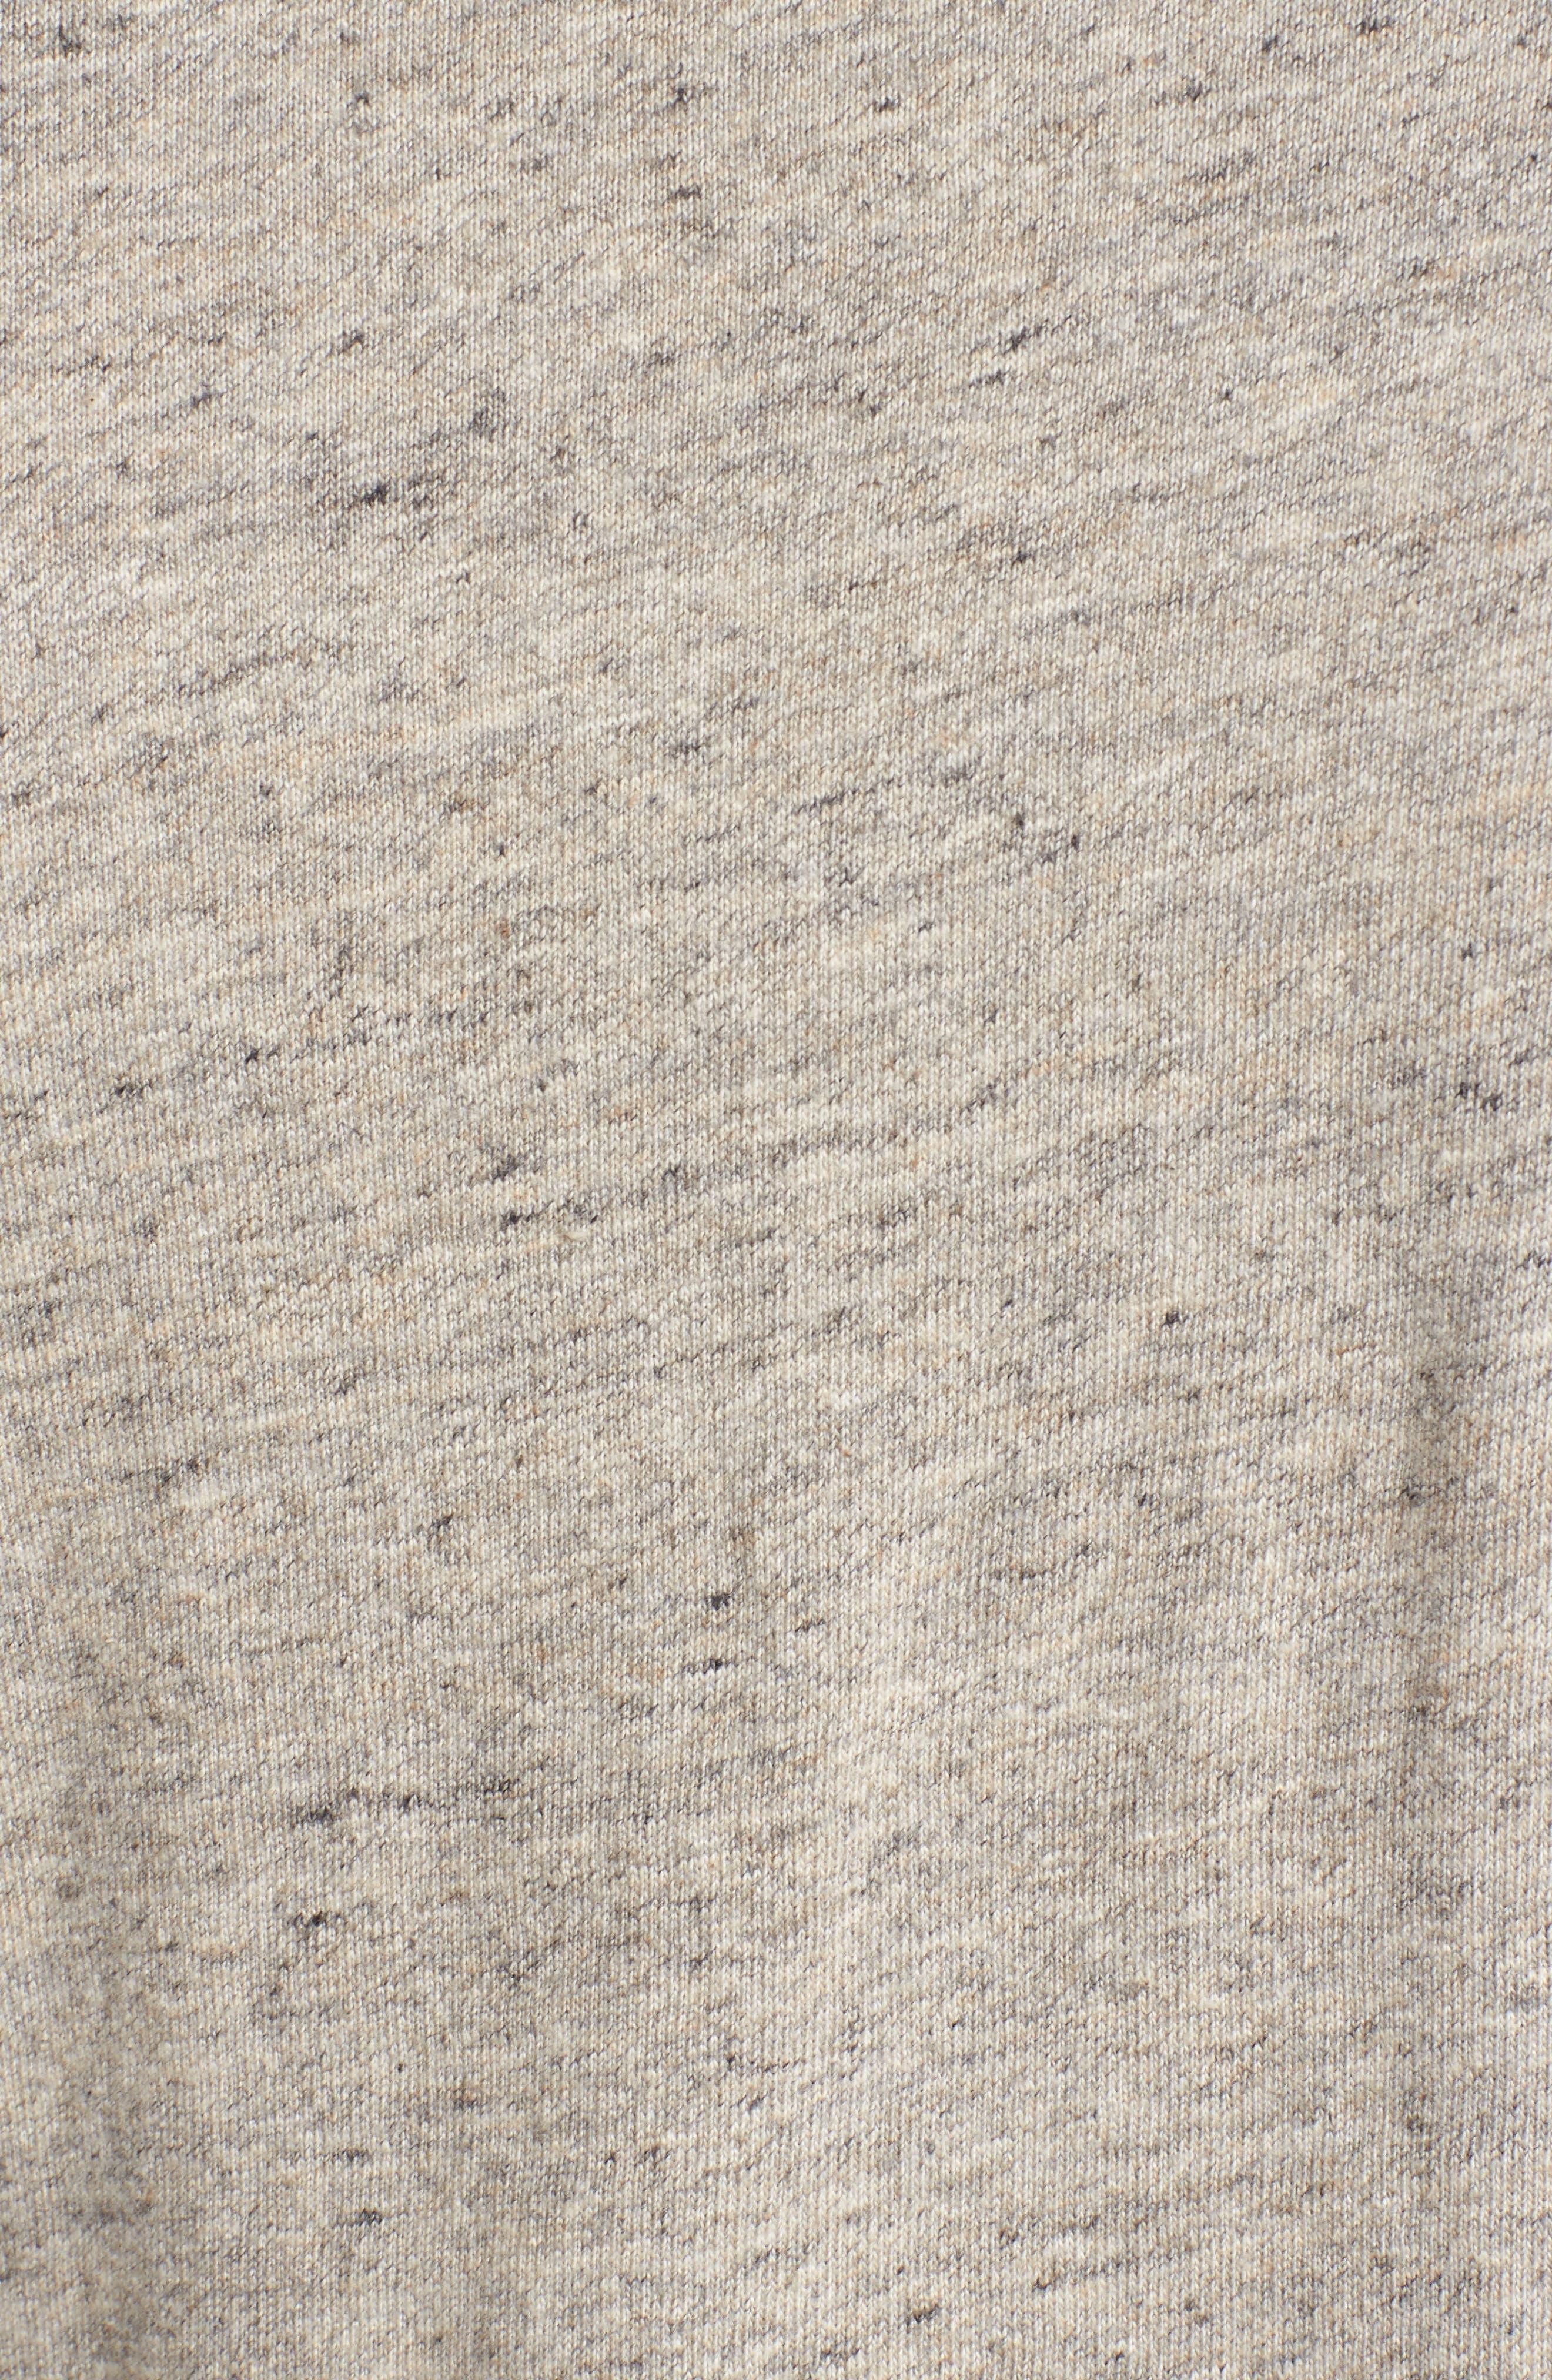 Levi's Vintage Clothing 1950s Sportswear Pocket T-Shirt,                             Alternate thumbnail 5, color,                             Grey